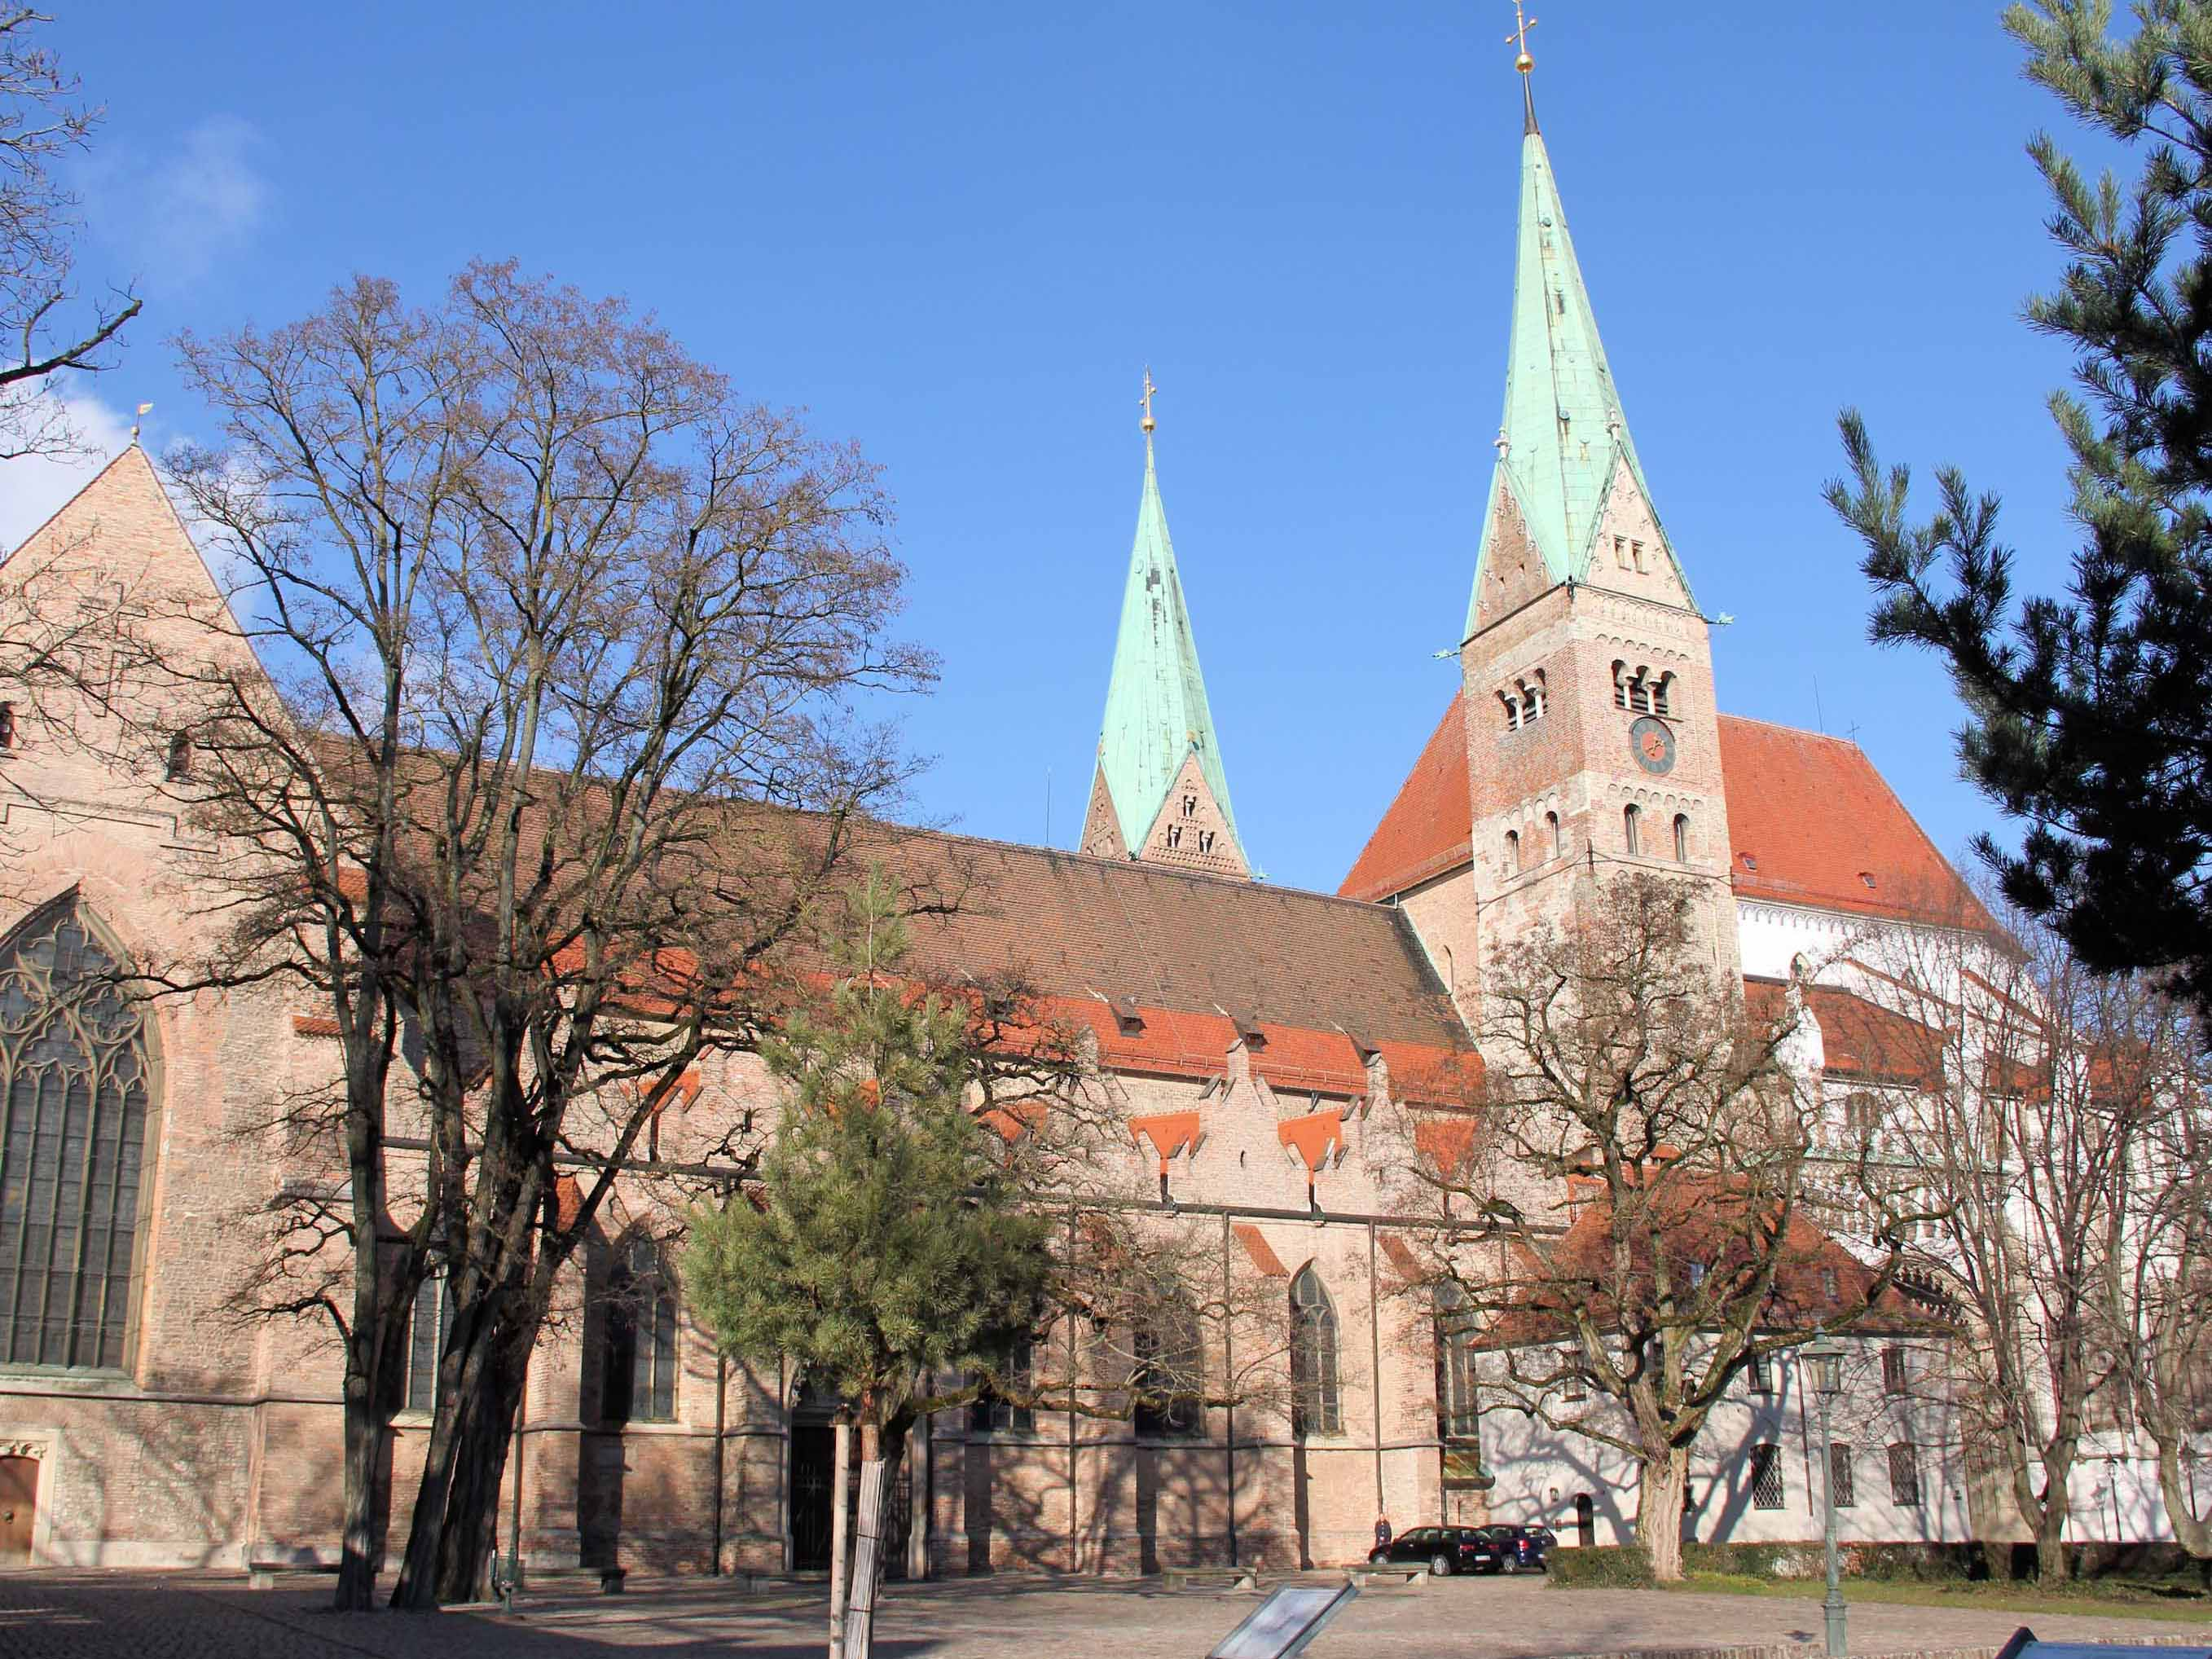 Foto: Daniel Jäckel / pba